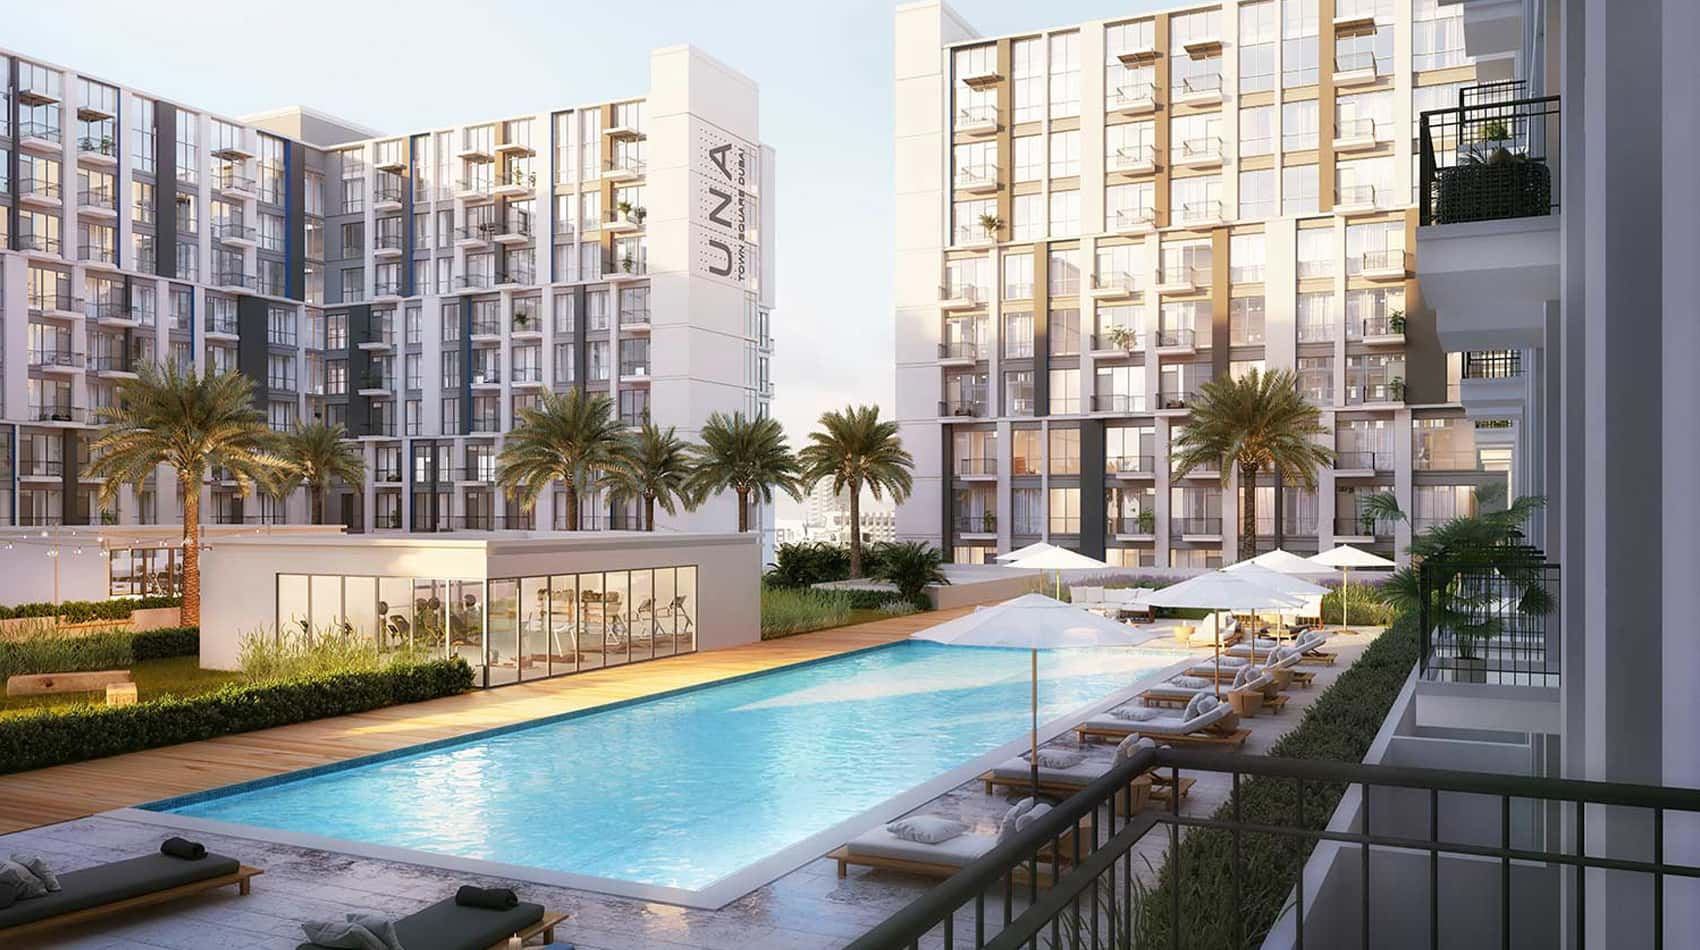 Buy NSHAMA Properties in Dubai